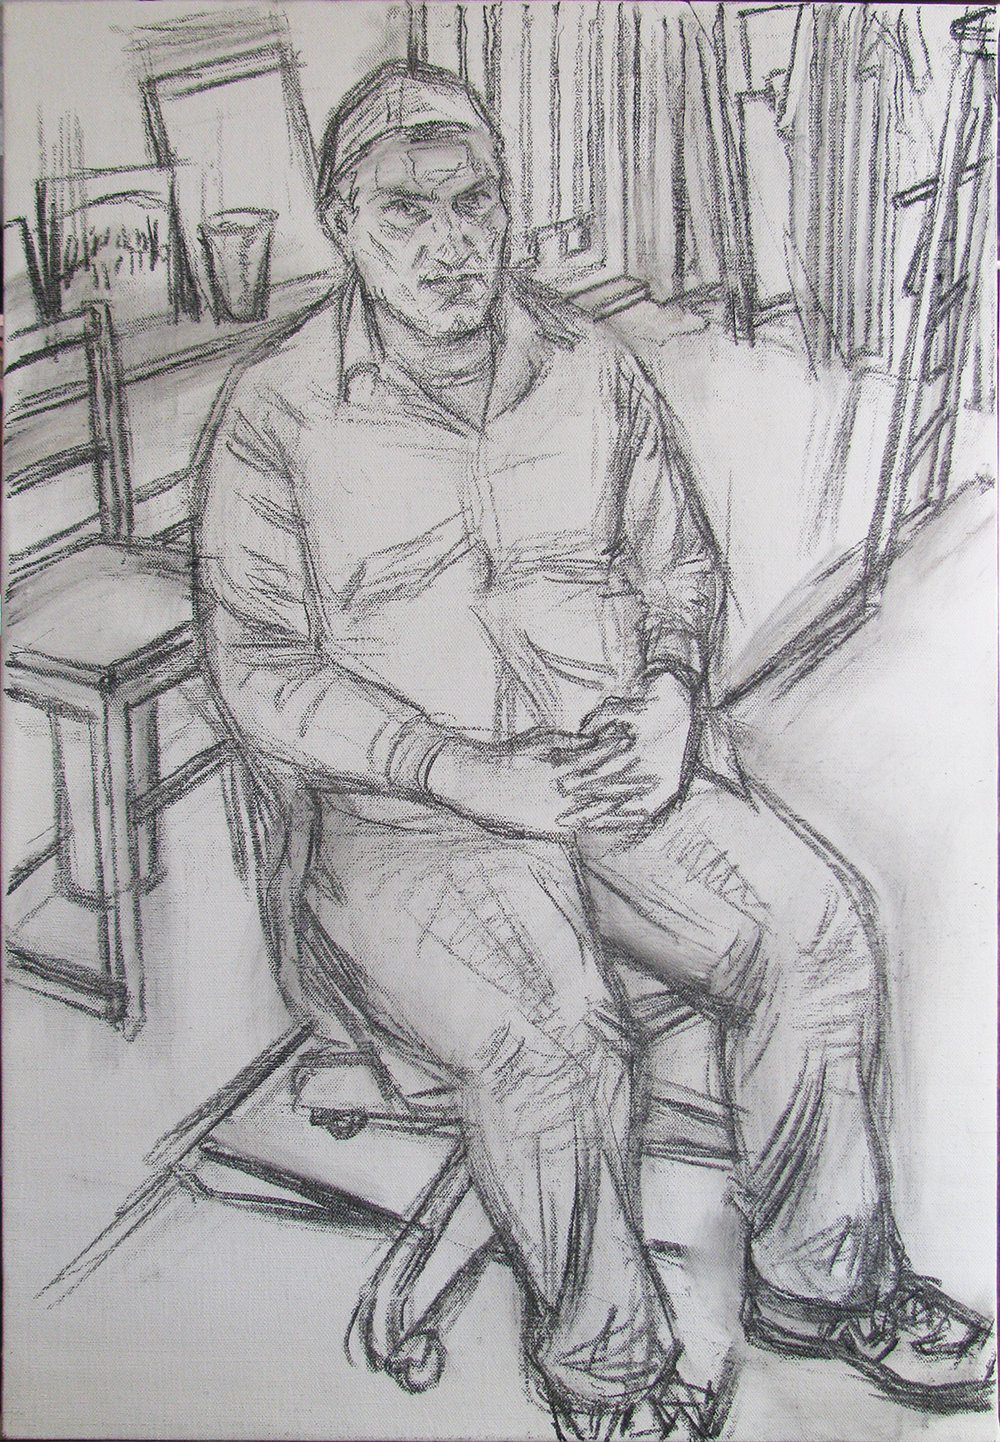 "JOE BRADLEY (drawing) charcoal on linen 22 x 33"" 2015"